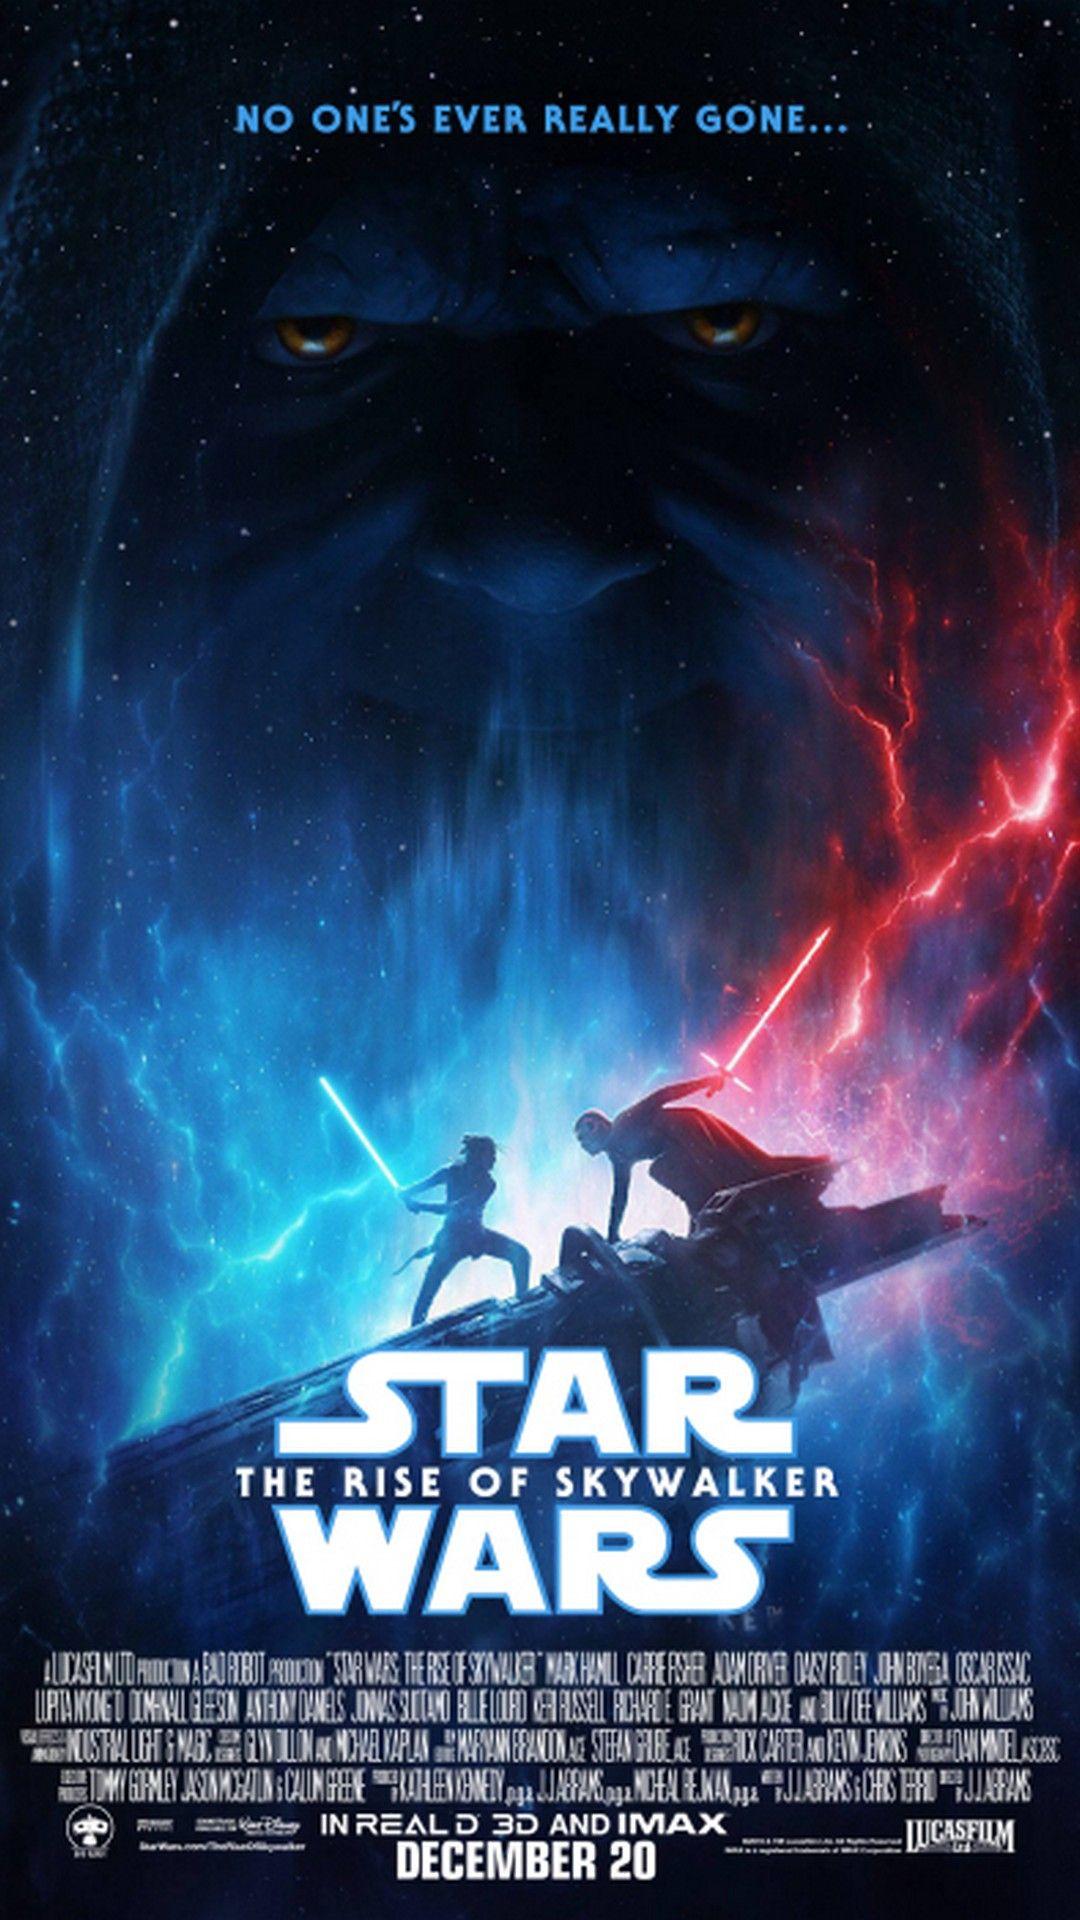 Star Wars The Rise Of Skywalker Poster Hd Best Movie Poster Wallpaper Hd Star Wars Watch Star Wars Skywalker